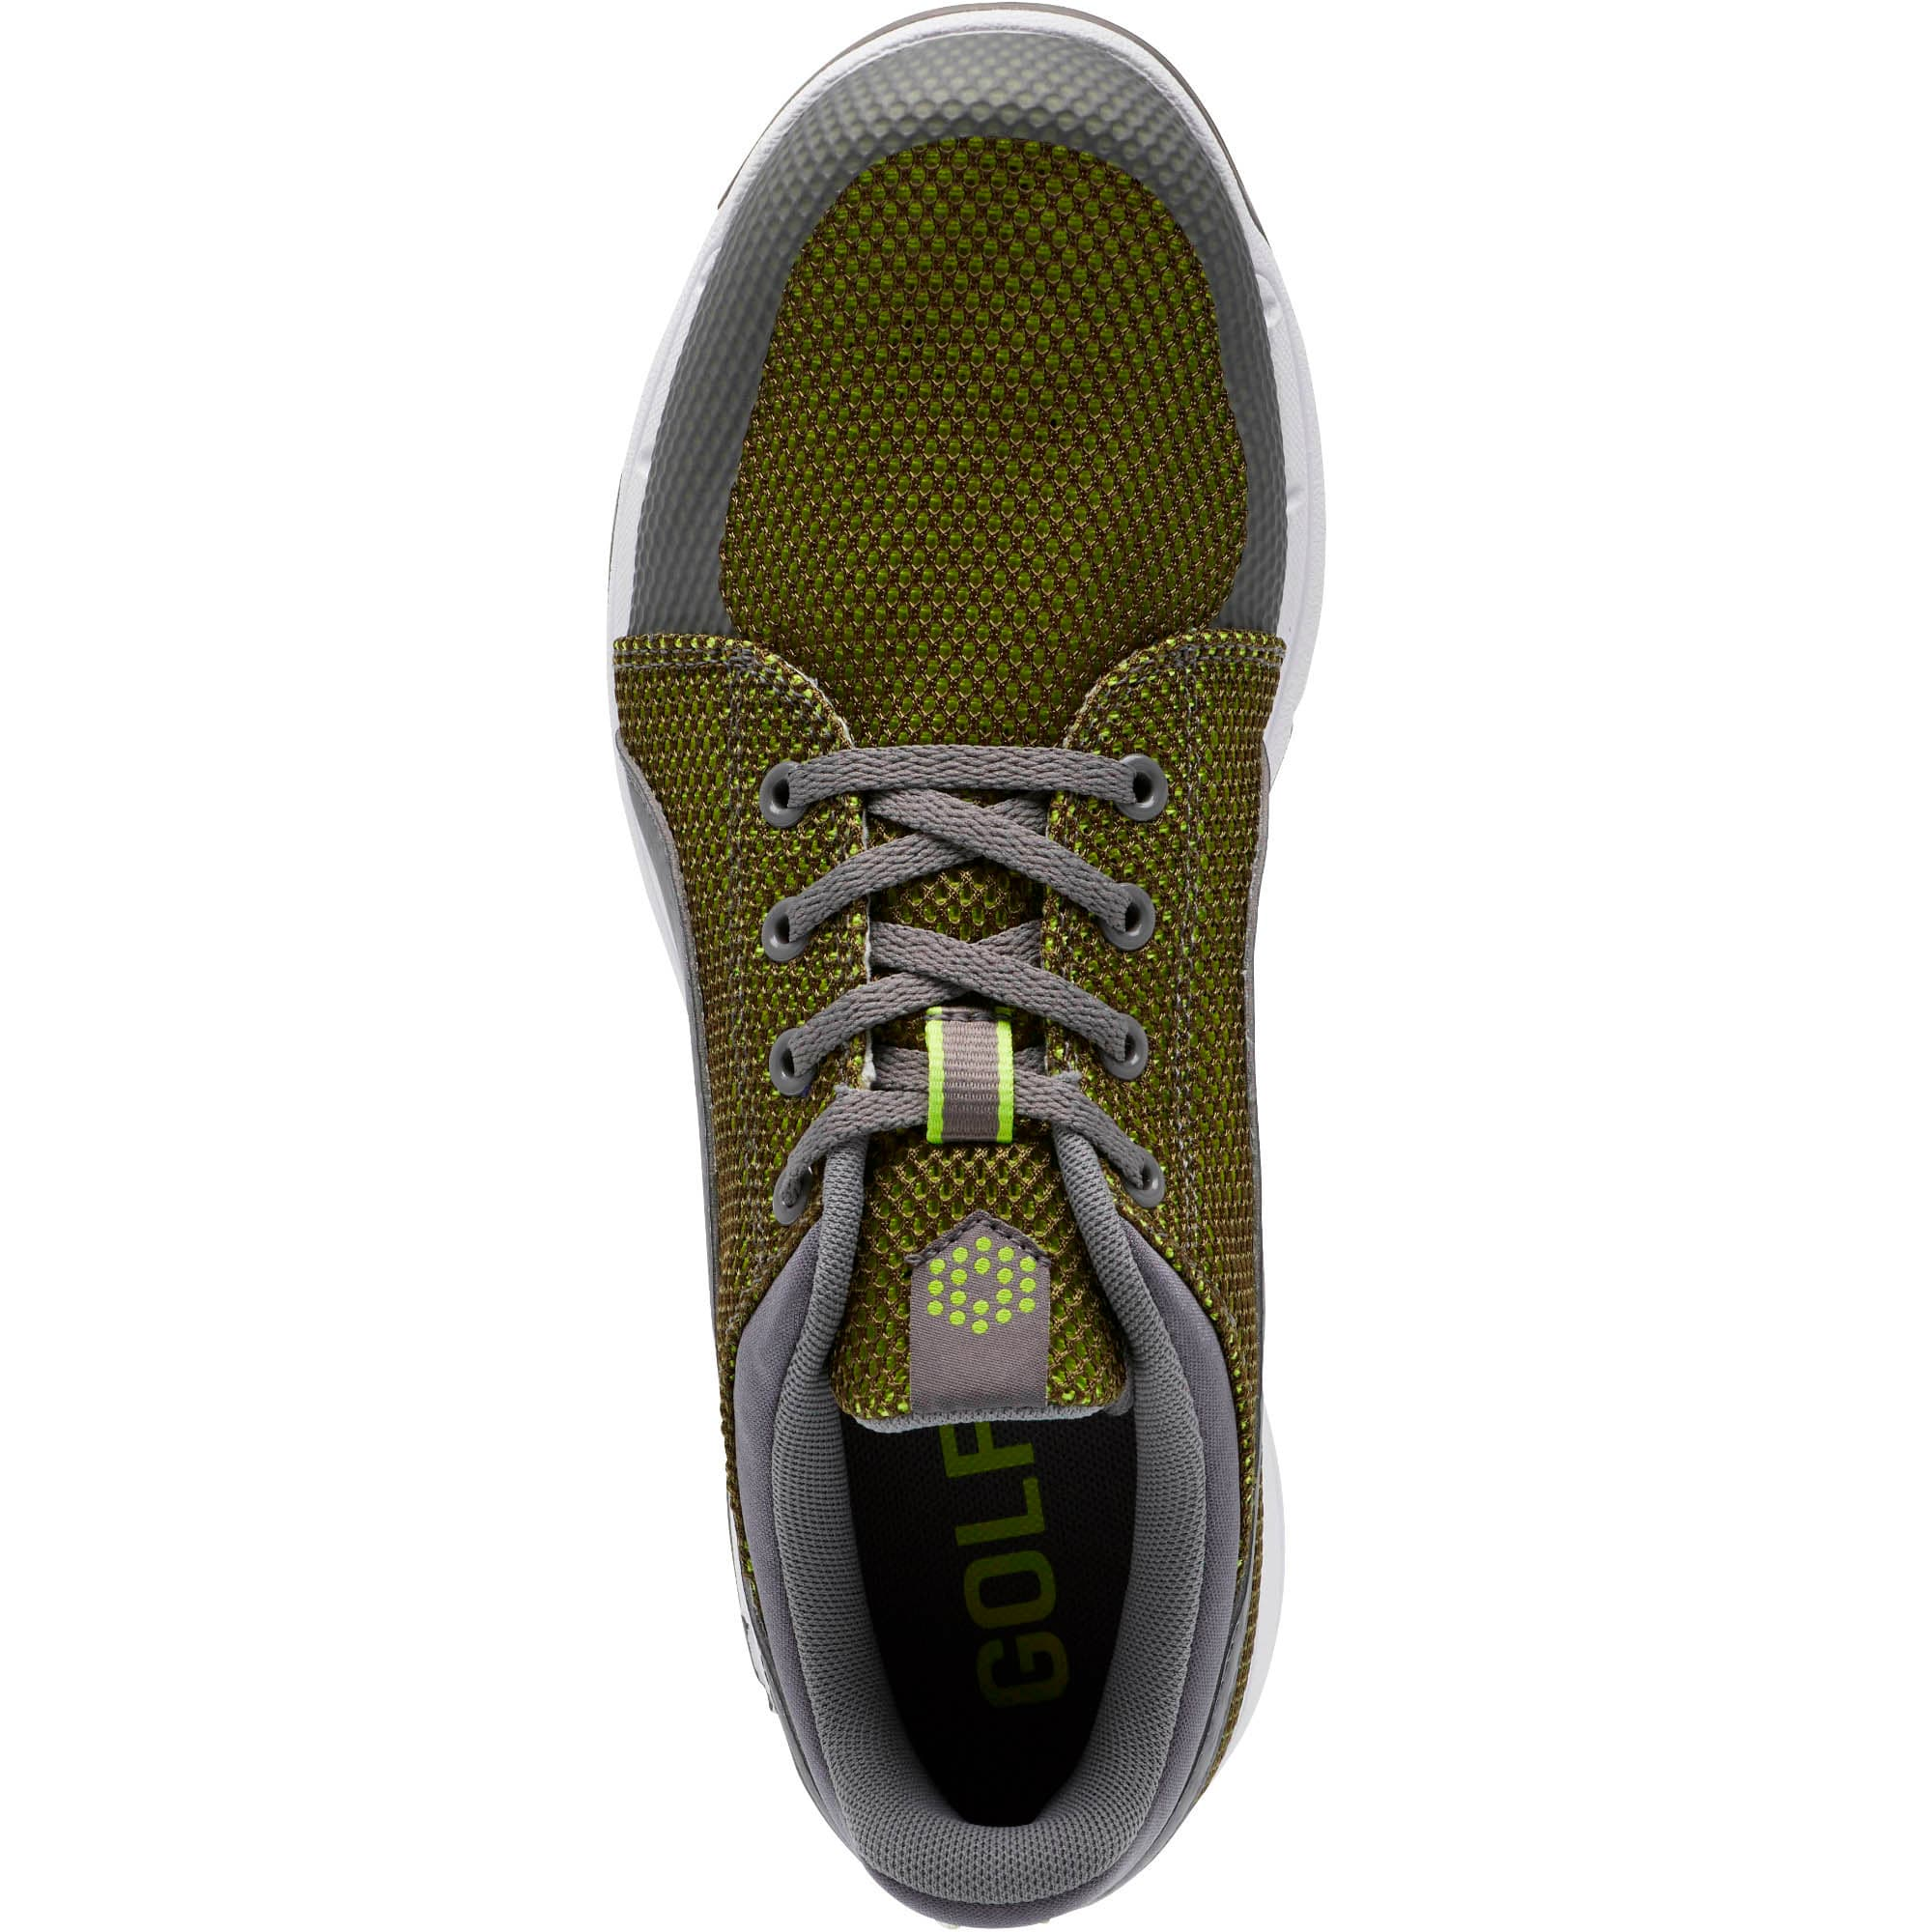 Thumbnail 5 of GRIP Sport Tech Men's Golf Shoes, QUIET SHADE-QUIET SHADE-Lime, medium